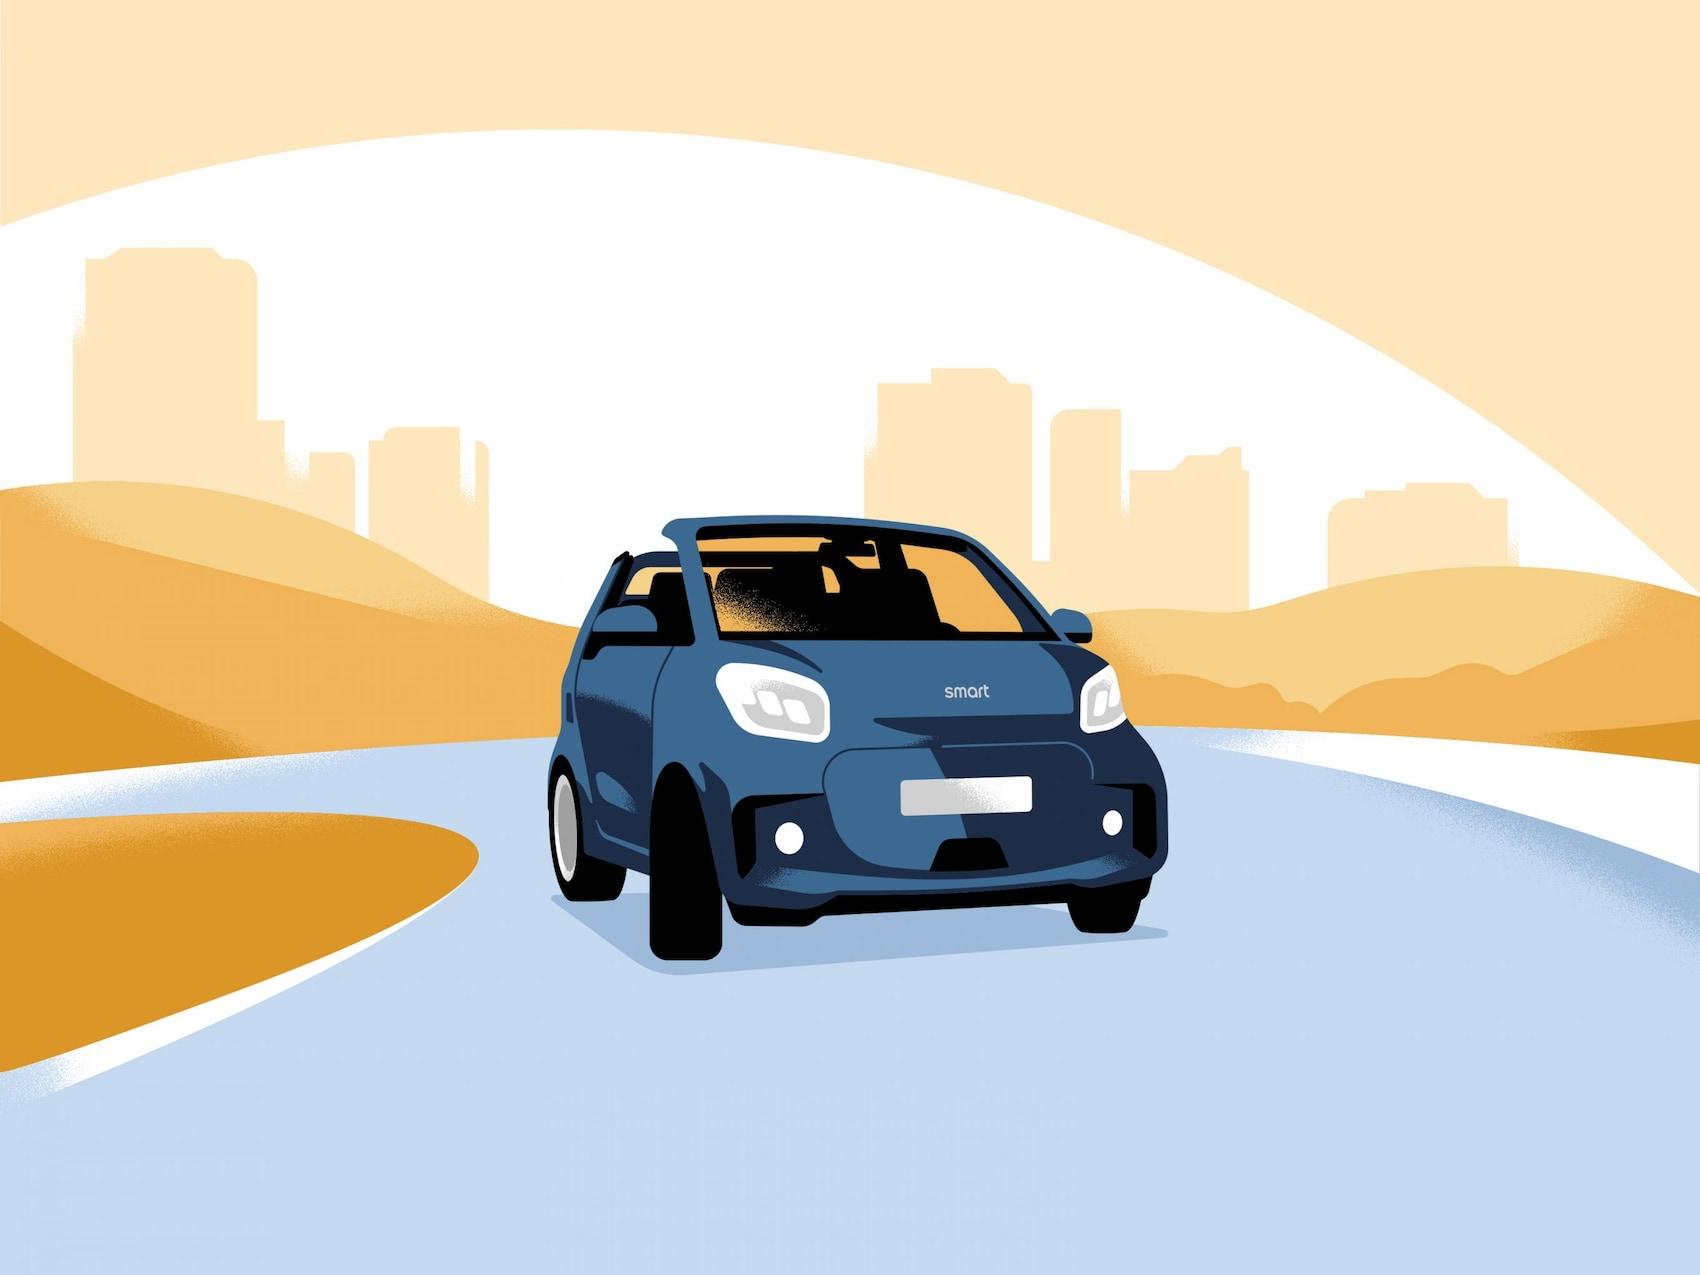 Vozilo smart EQ fortwo vozi po cesti.